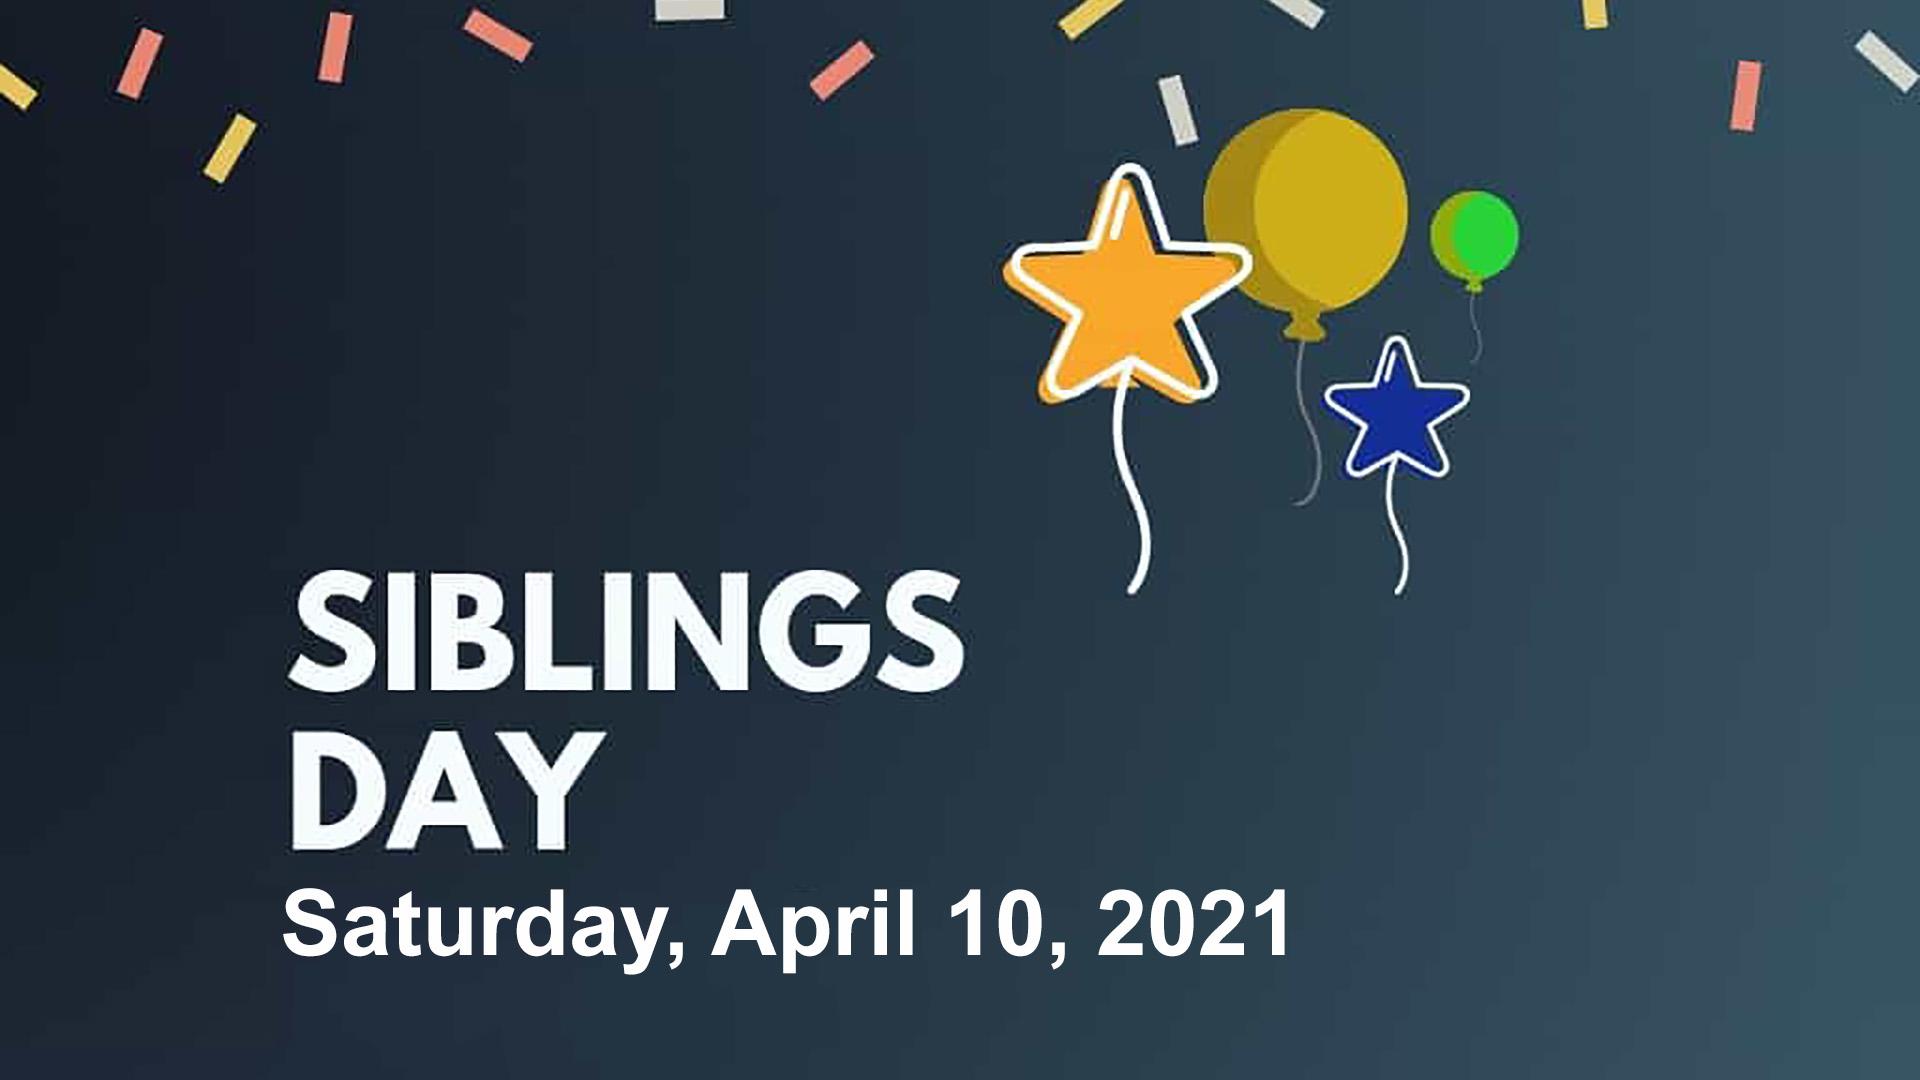 April 10 National Siblings Day Digital Signage Graphic